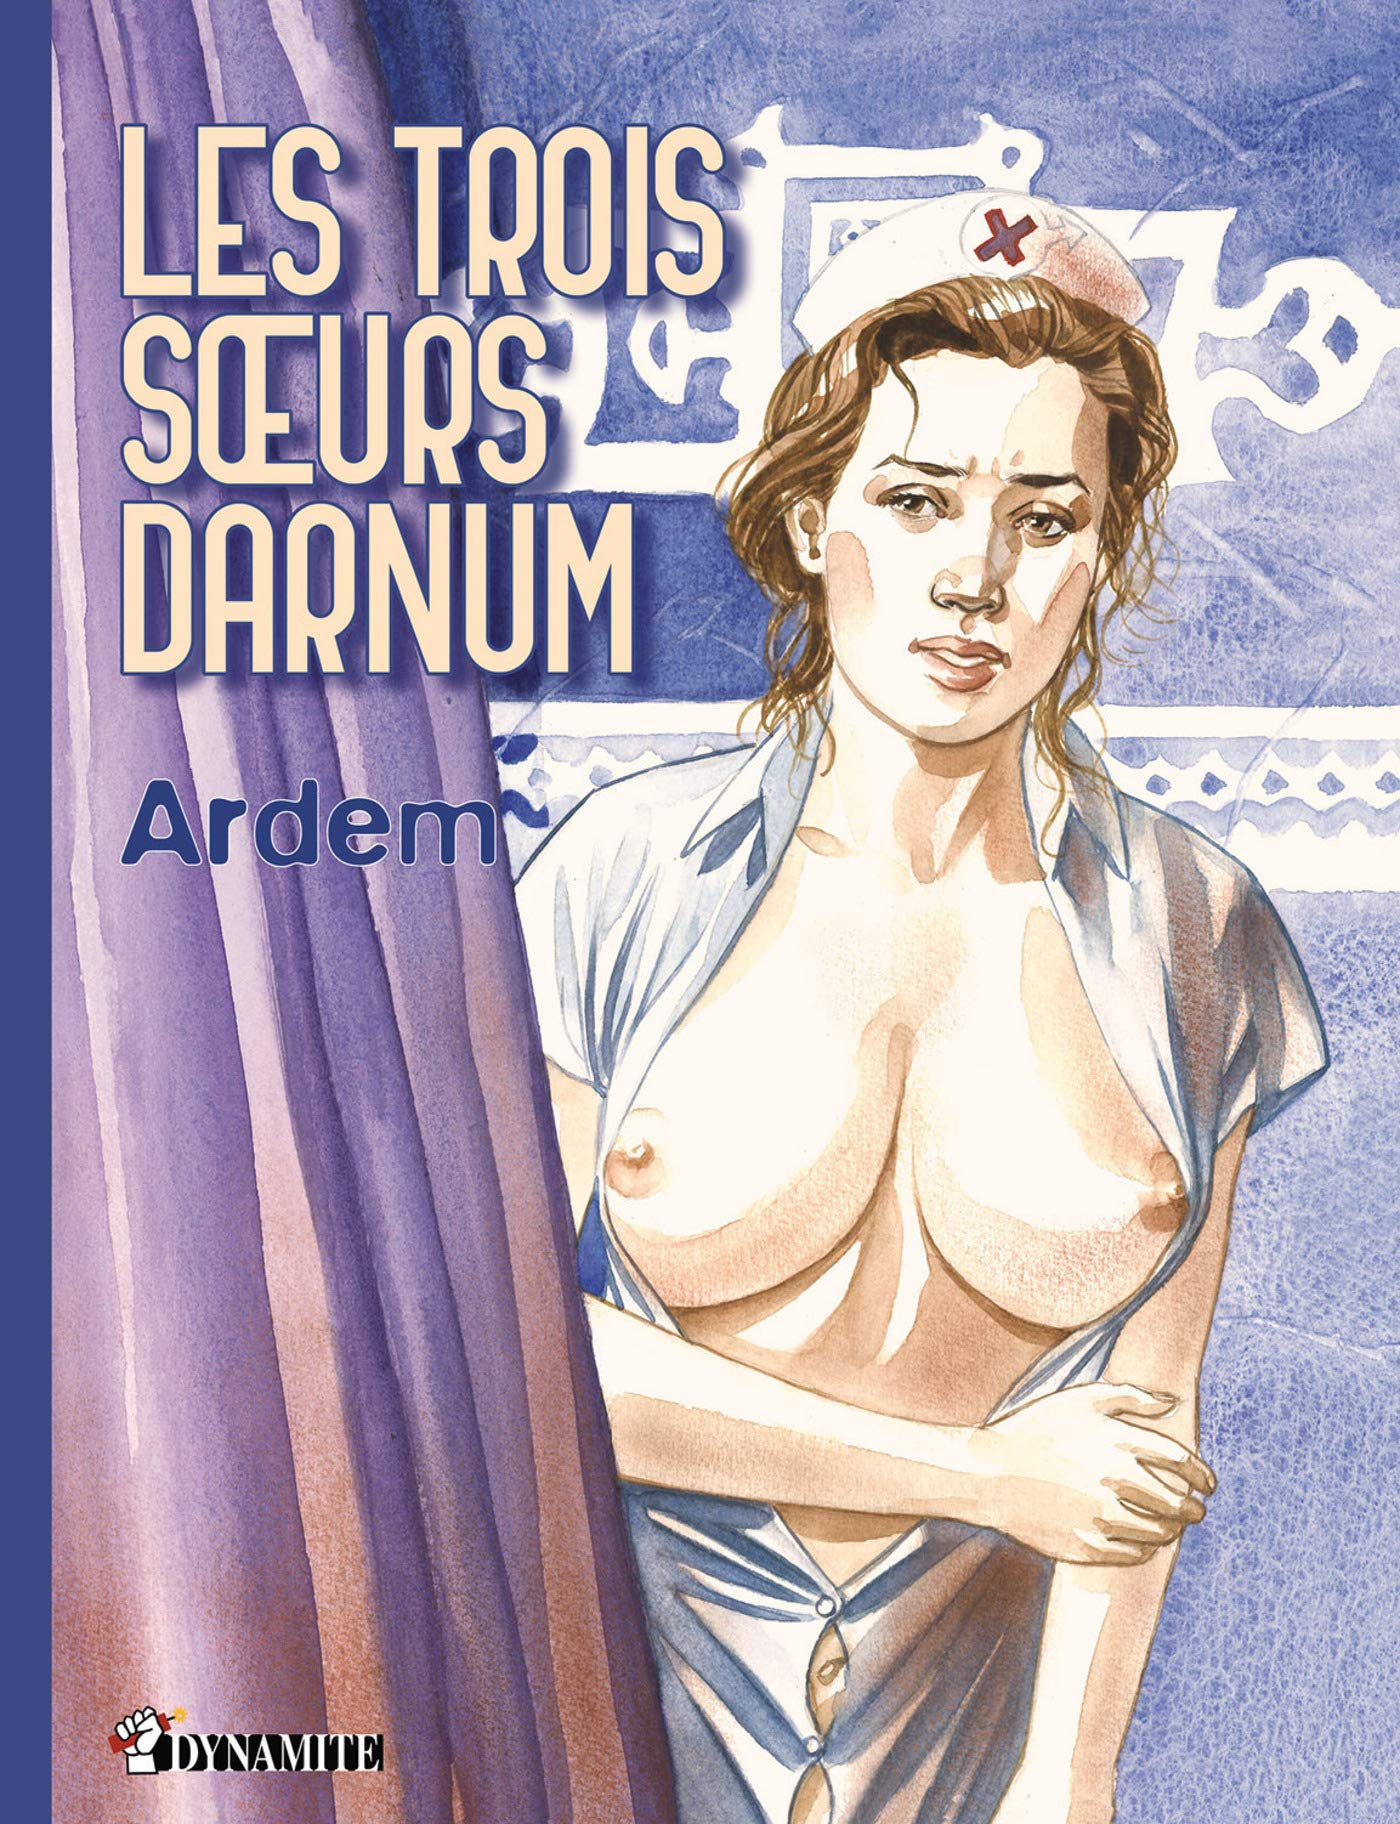 Les trois soeurs Darnum por Ardem